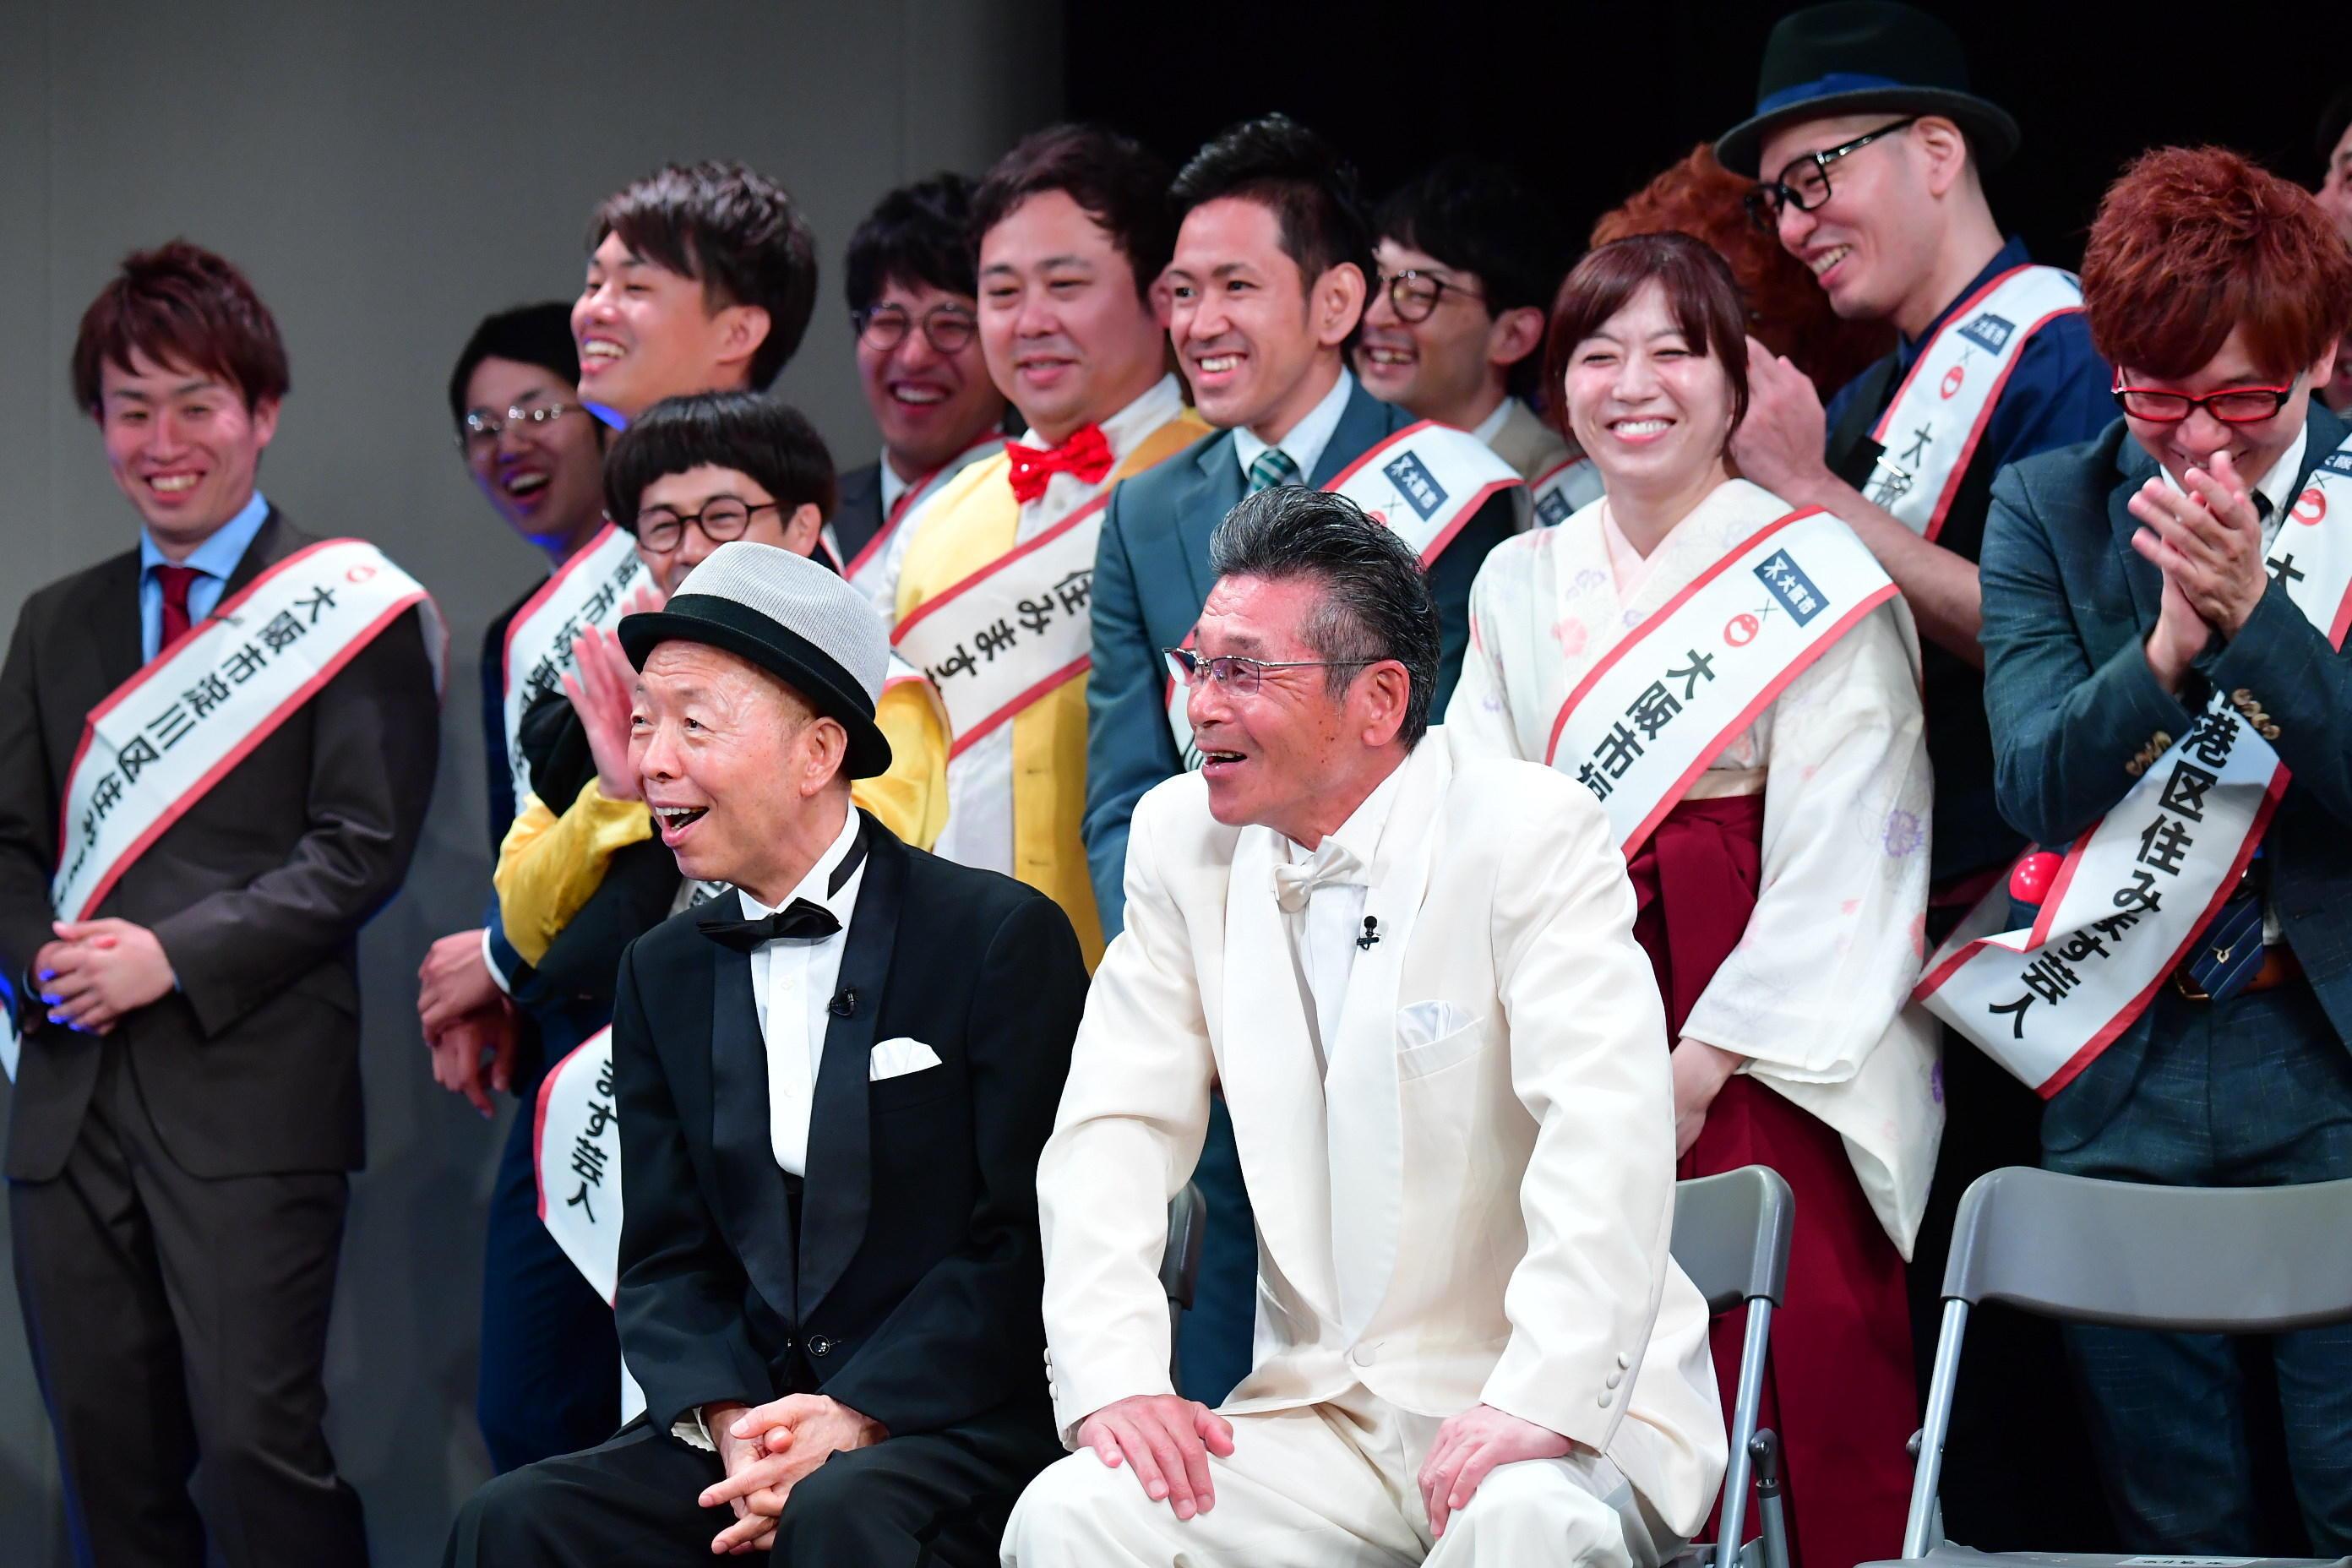 http://news.yoshimoto.co.jp/20180627221706-b3b0c357b84e01268c84d3a124de4b70d3e14c04.jpg